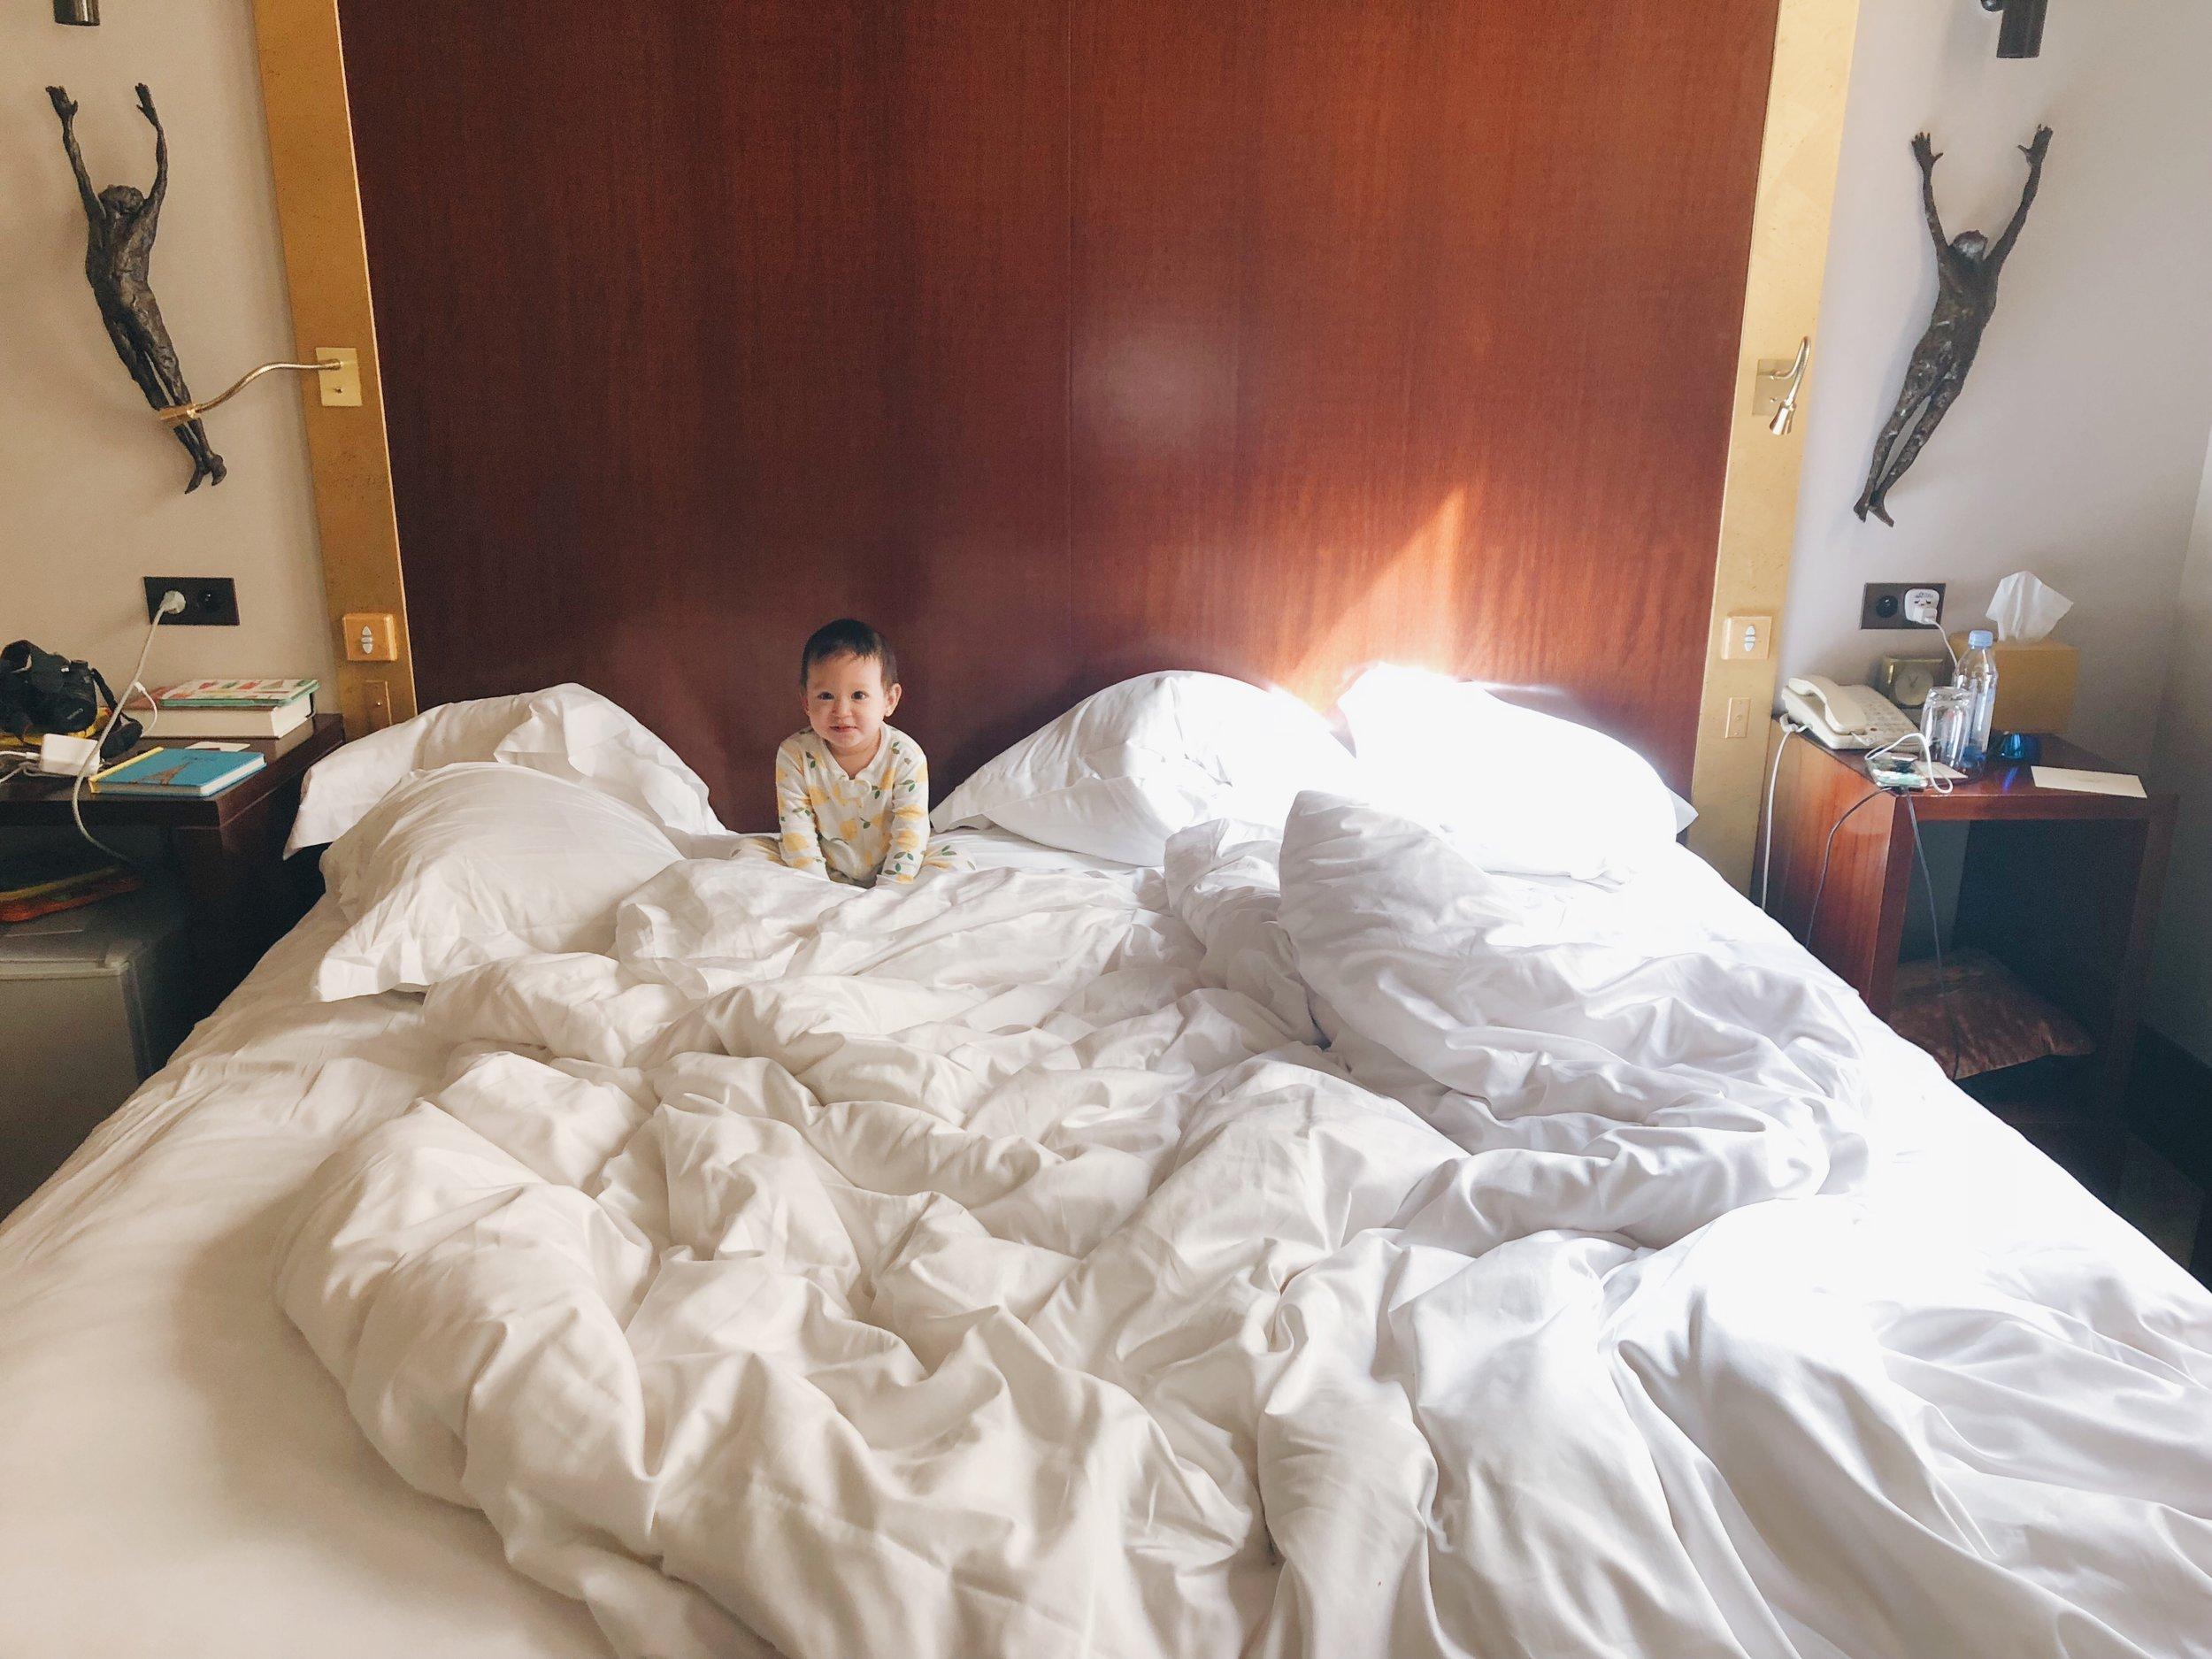 Review of Luxury Hotel Park Hyatt Paris by Marissa | travelhappy